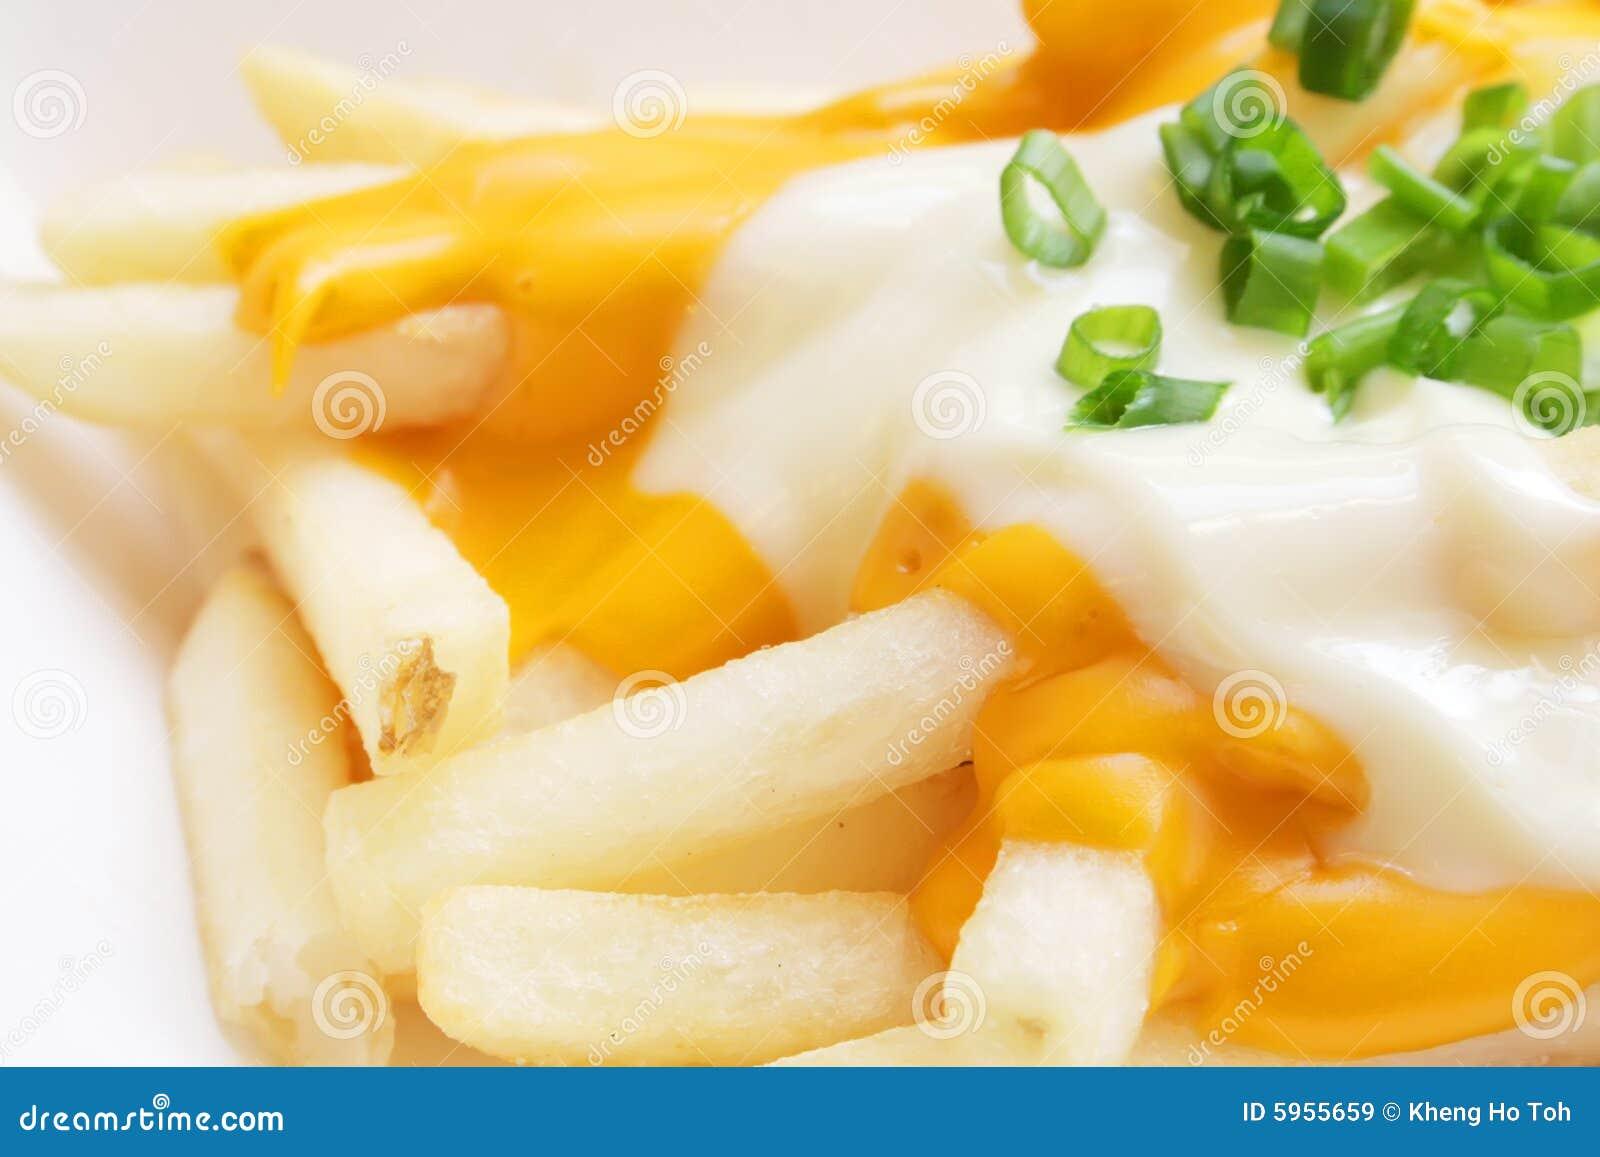 Kartoffelchips mit geschmolzener Käse-Soße